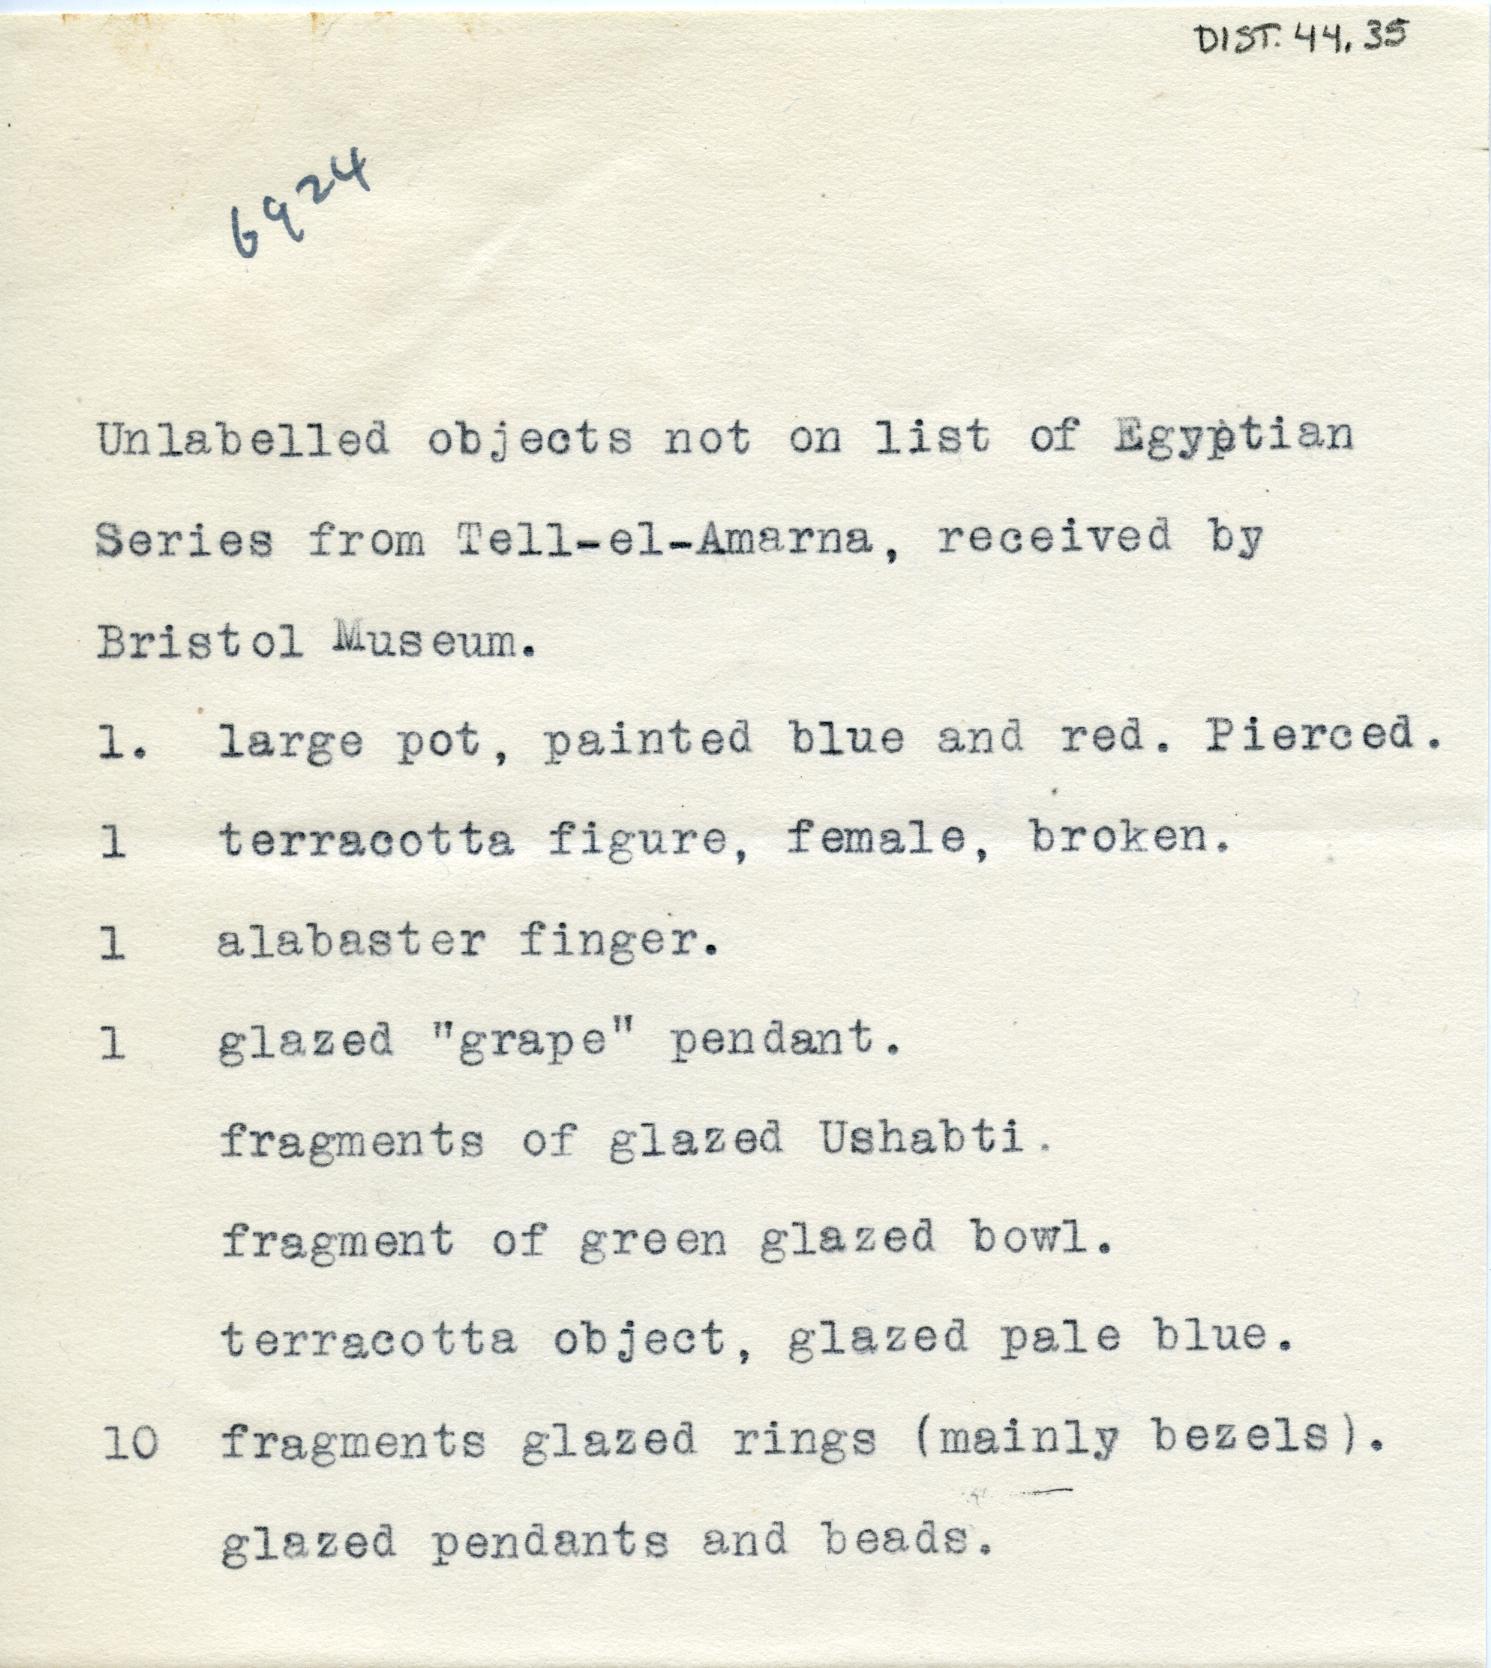 1923-25 el-Amarna DIST.44.35